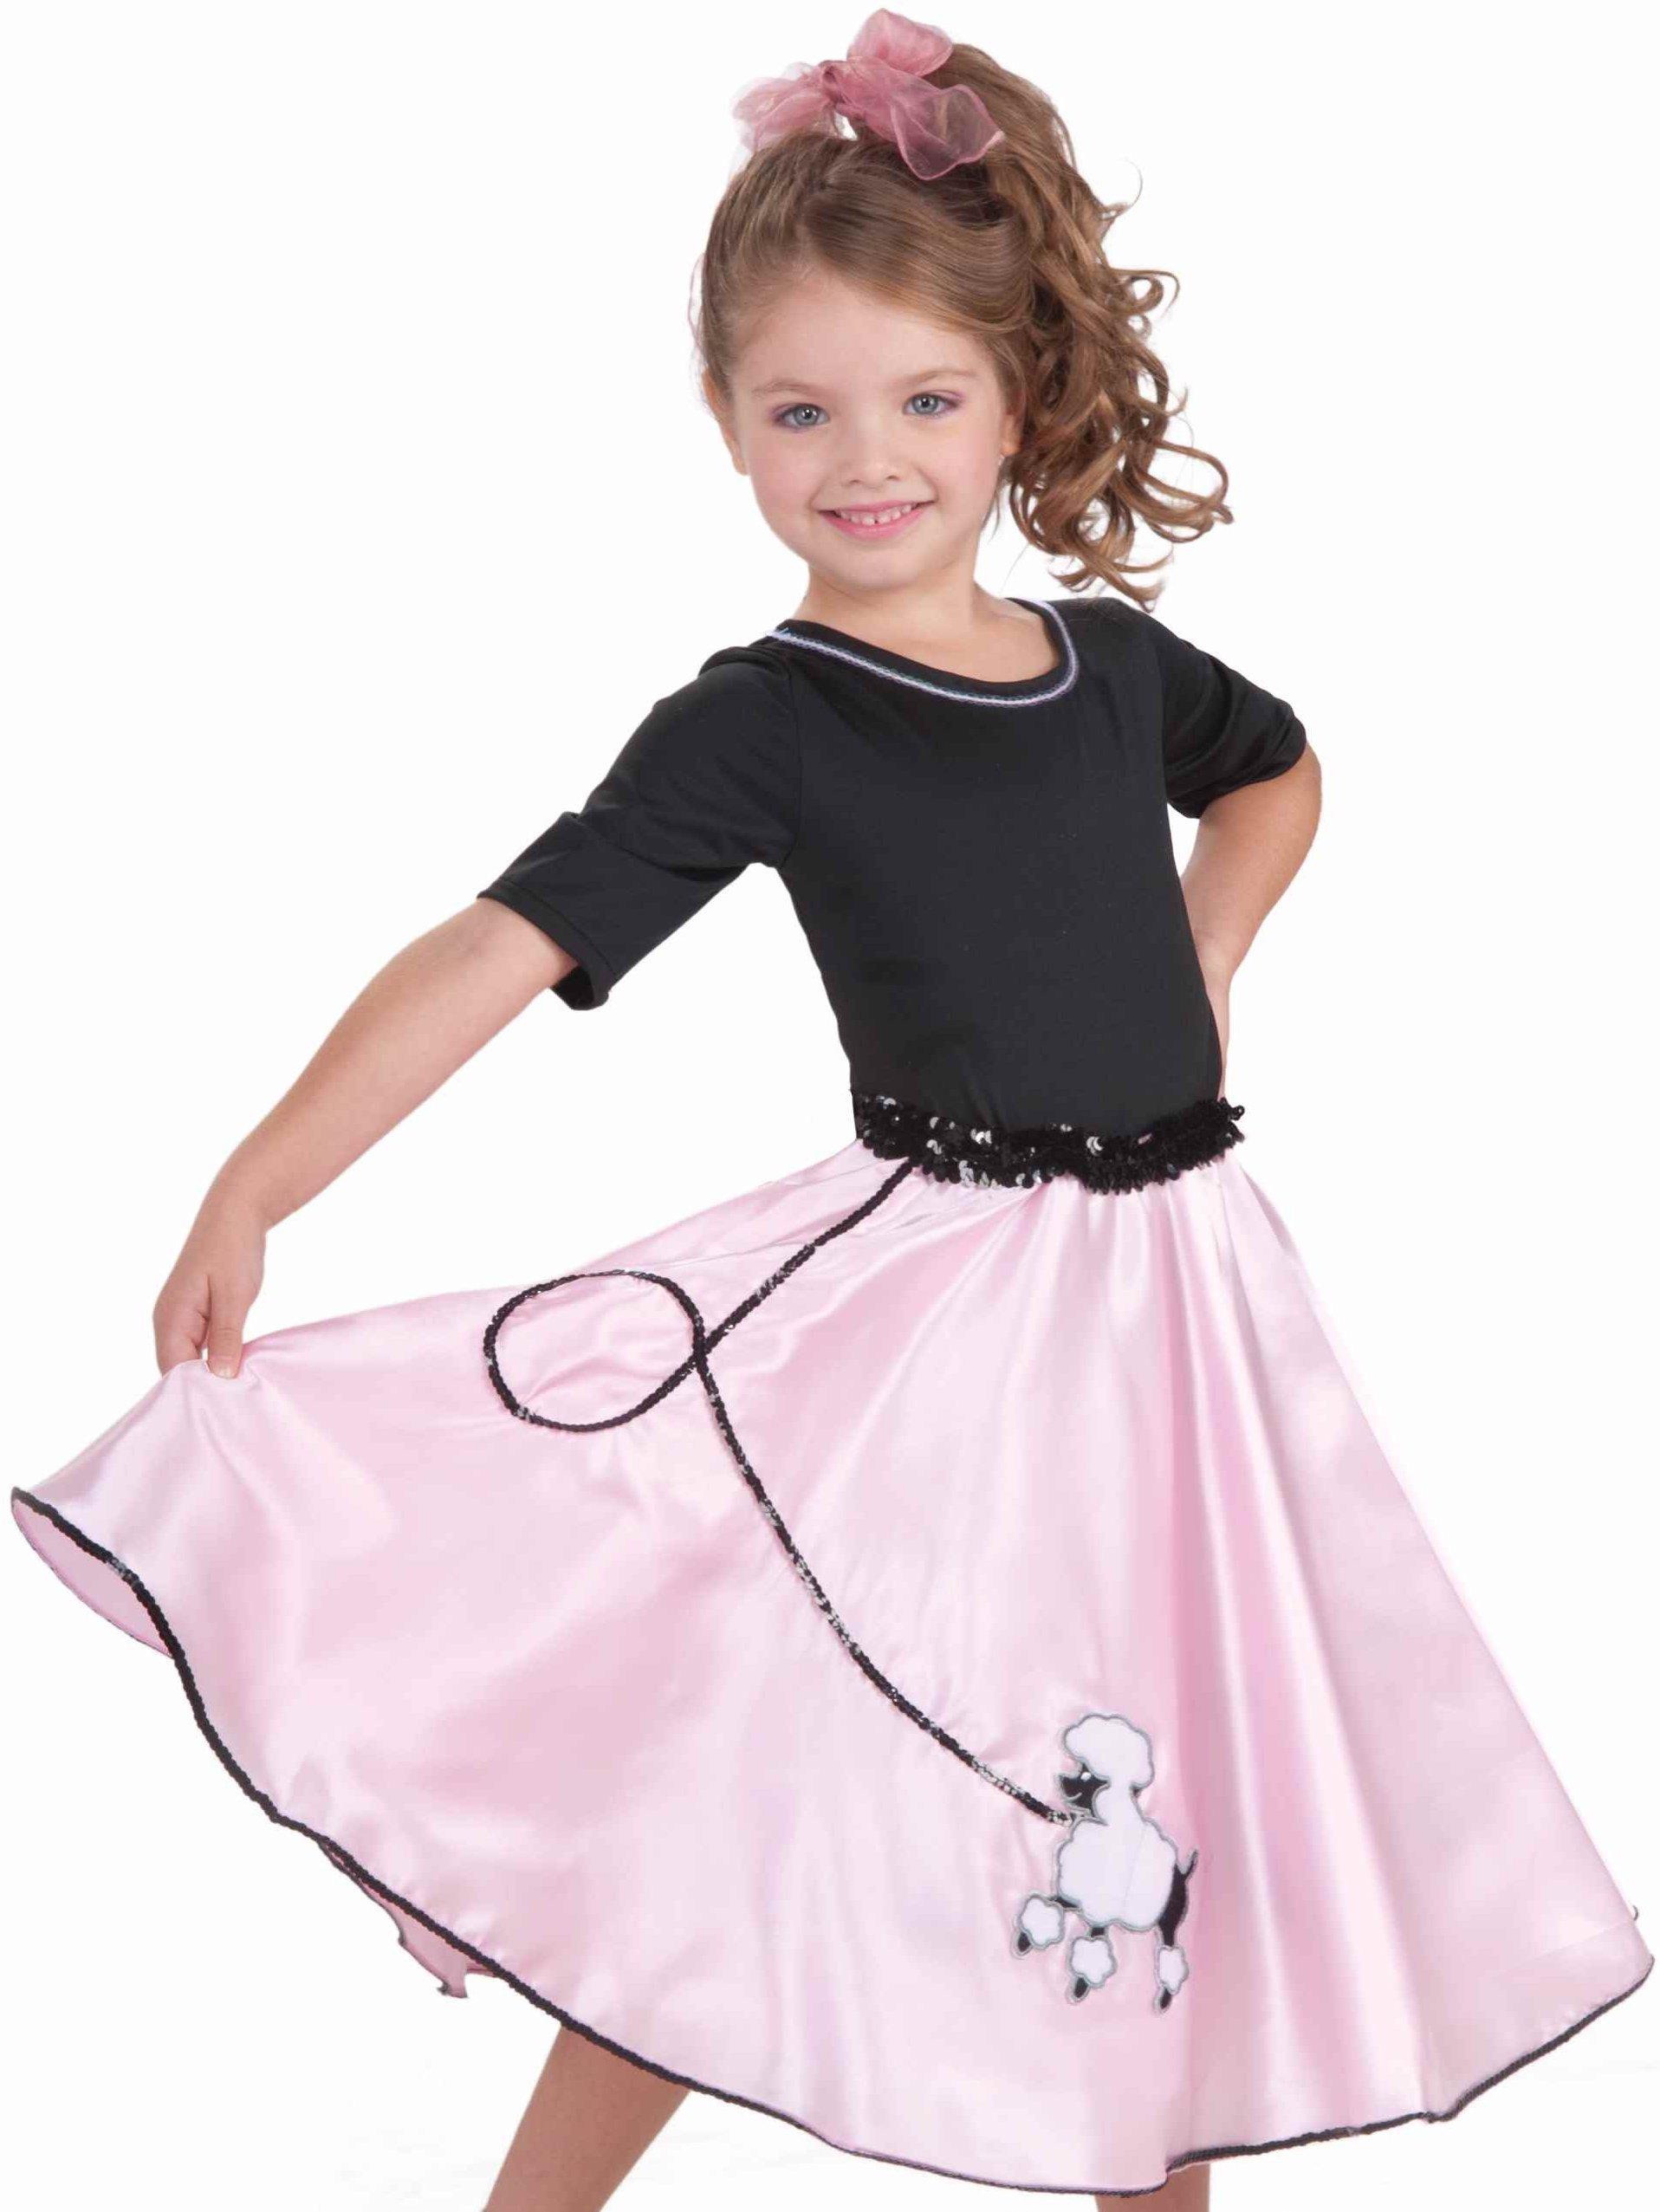 Girls 50s Poodle Skirt Sock Hop Kids Halloween Costume | eBay